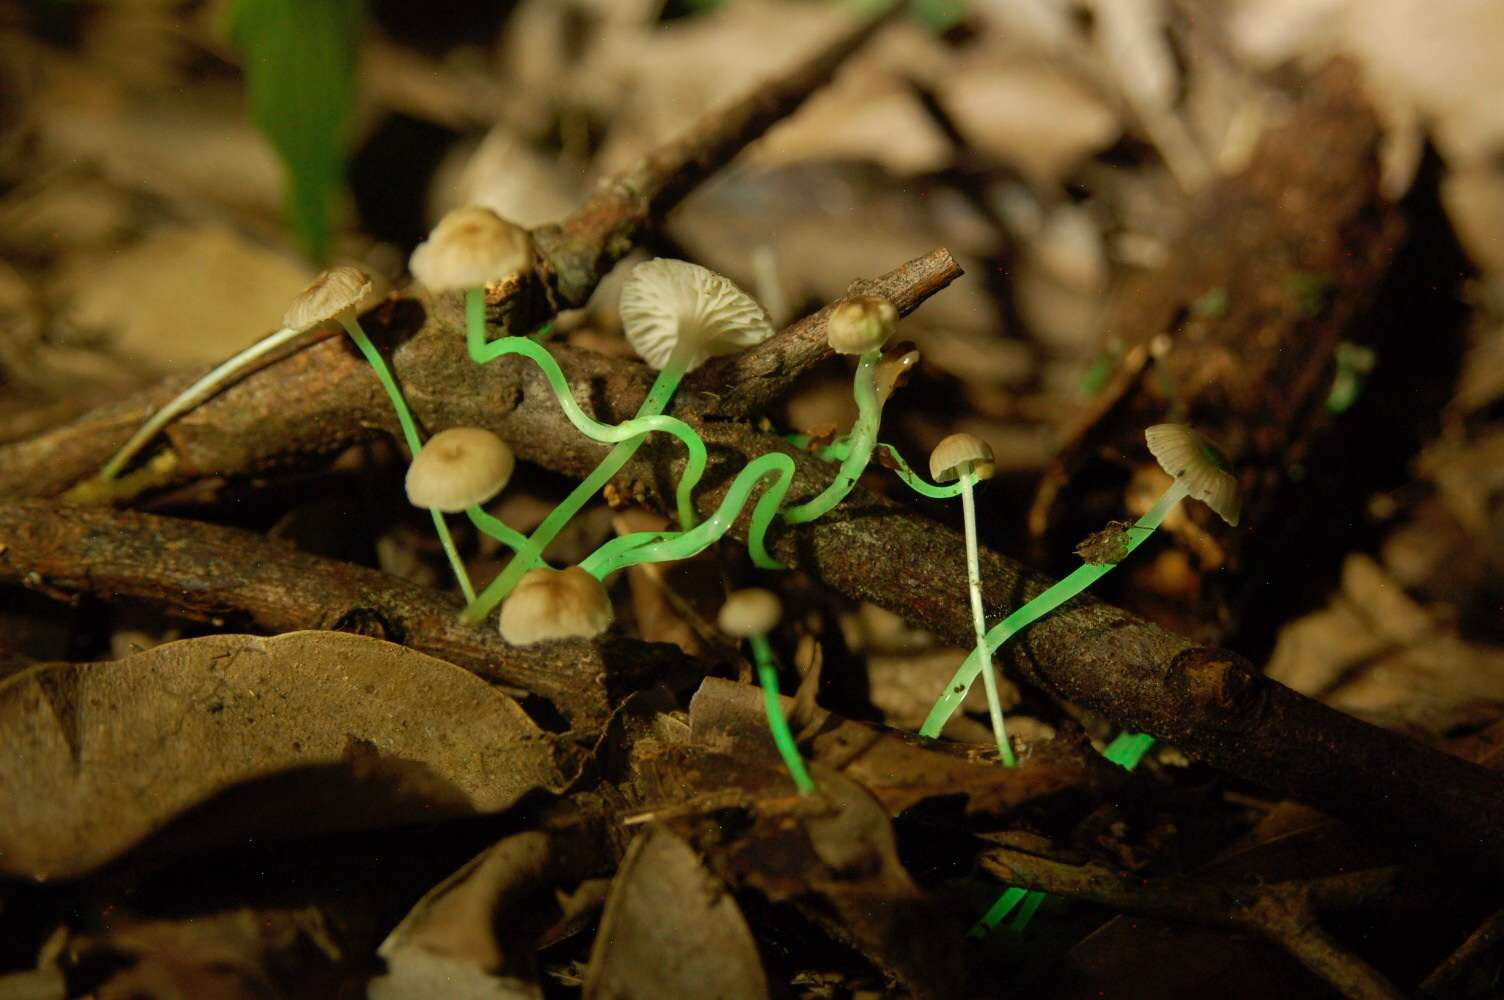 Mycena luxaeterna growing in leaf litter with stipes glowing green